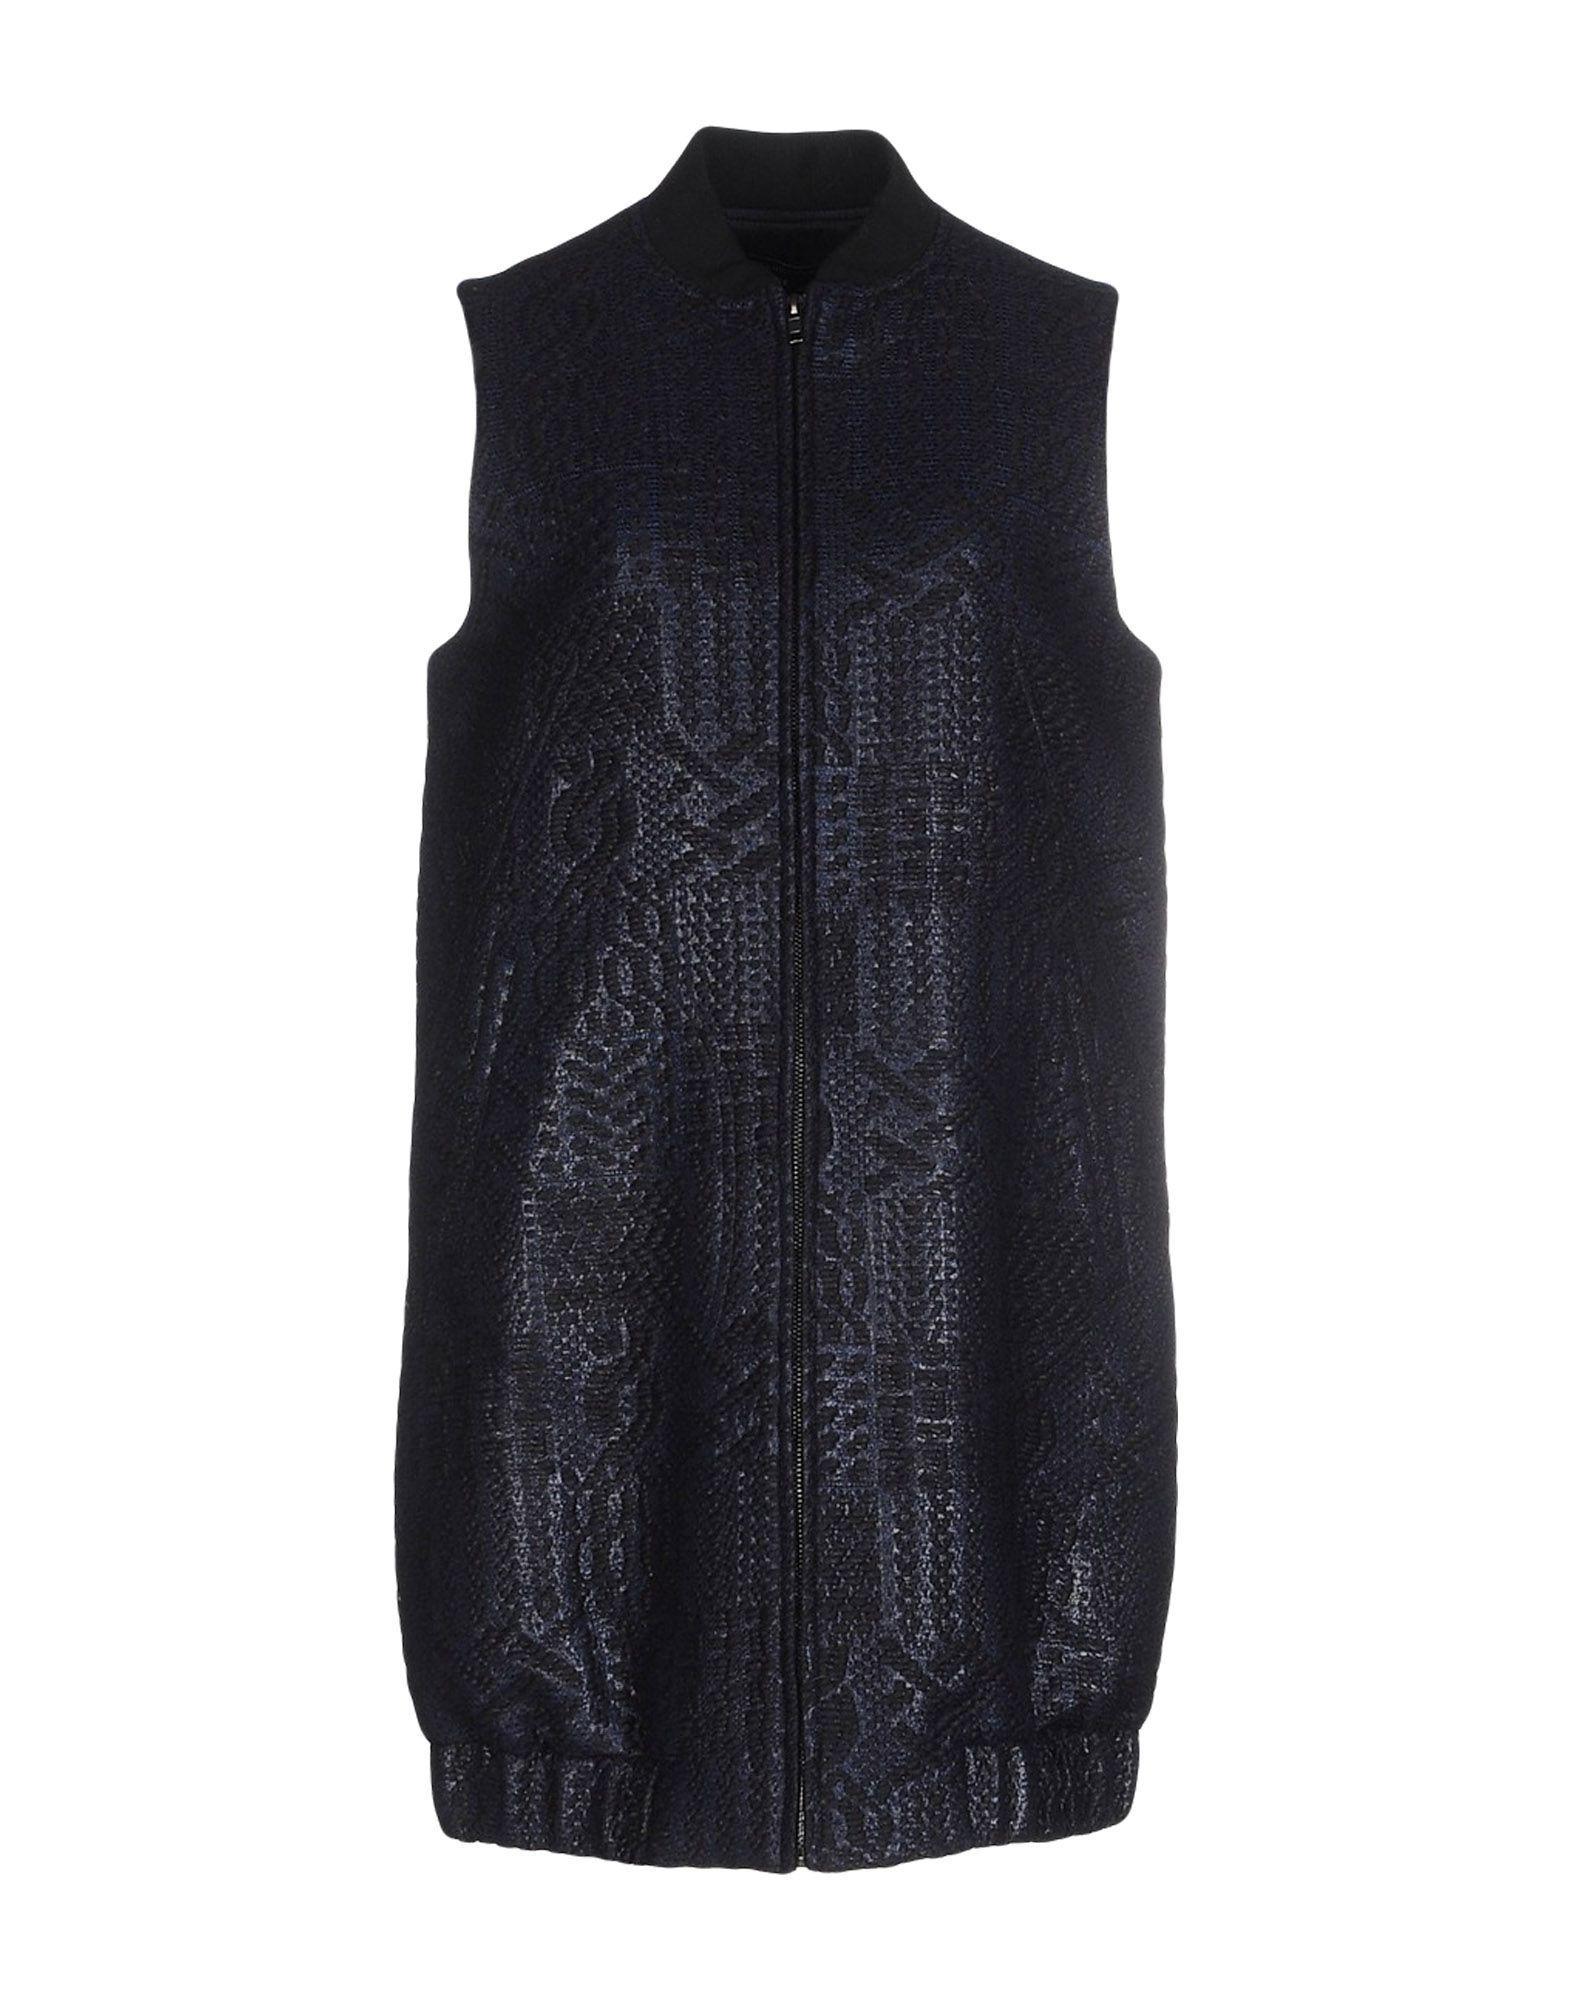 Tess Giberson Coat In Dark Blue